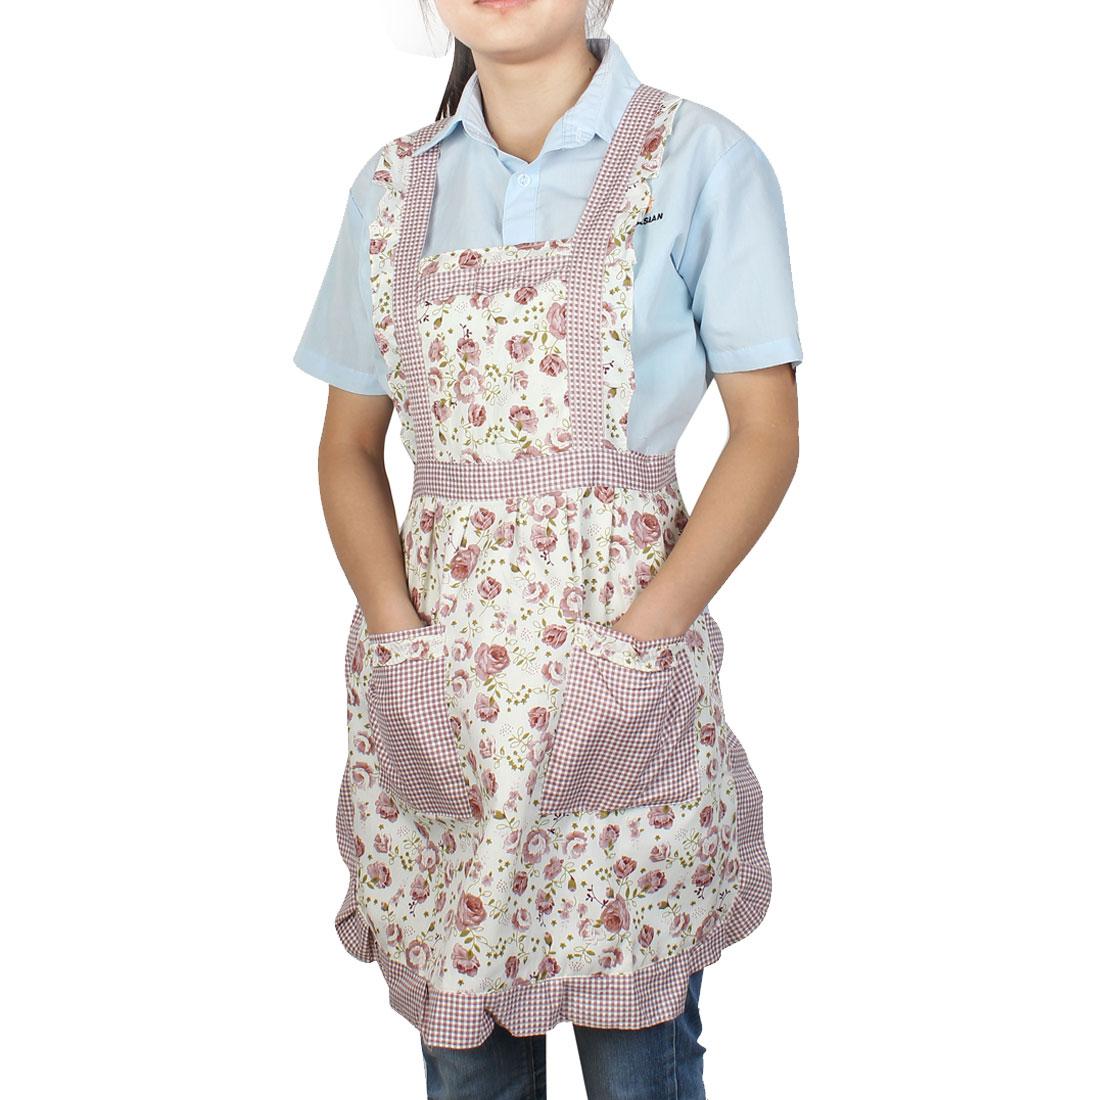 Housewares Cooking Light Purple Rose Pattern Dual Pocket Self Tie Bib Aprons